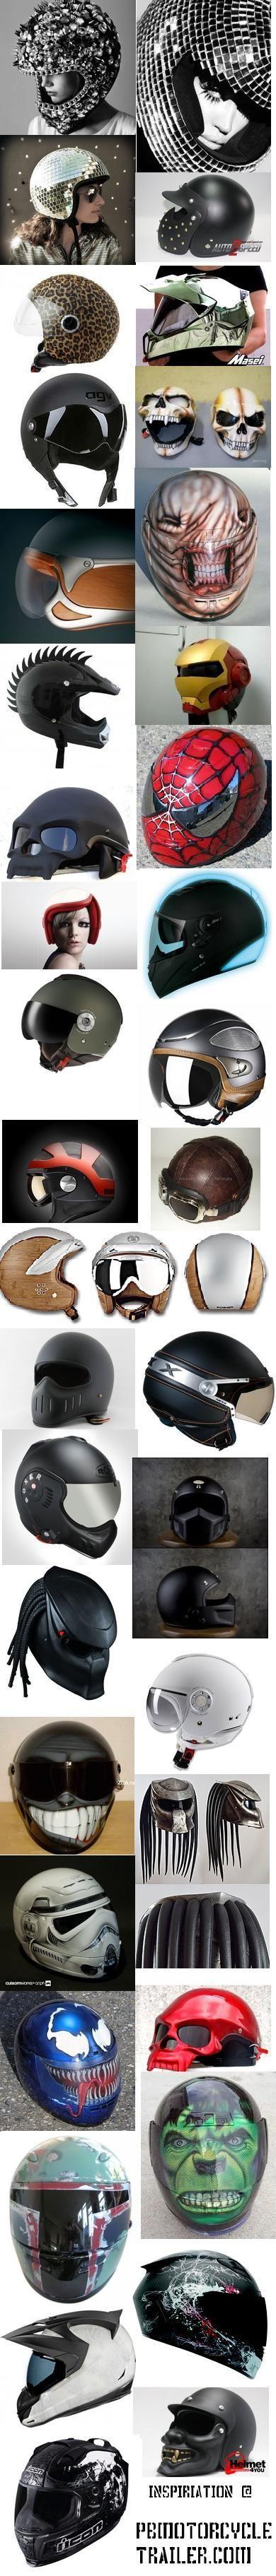 bitchin helmet collection.